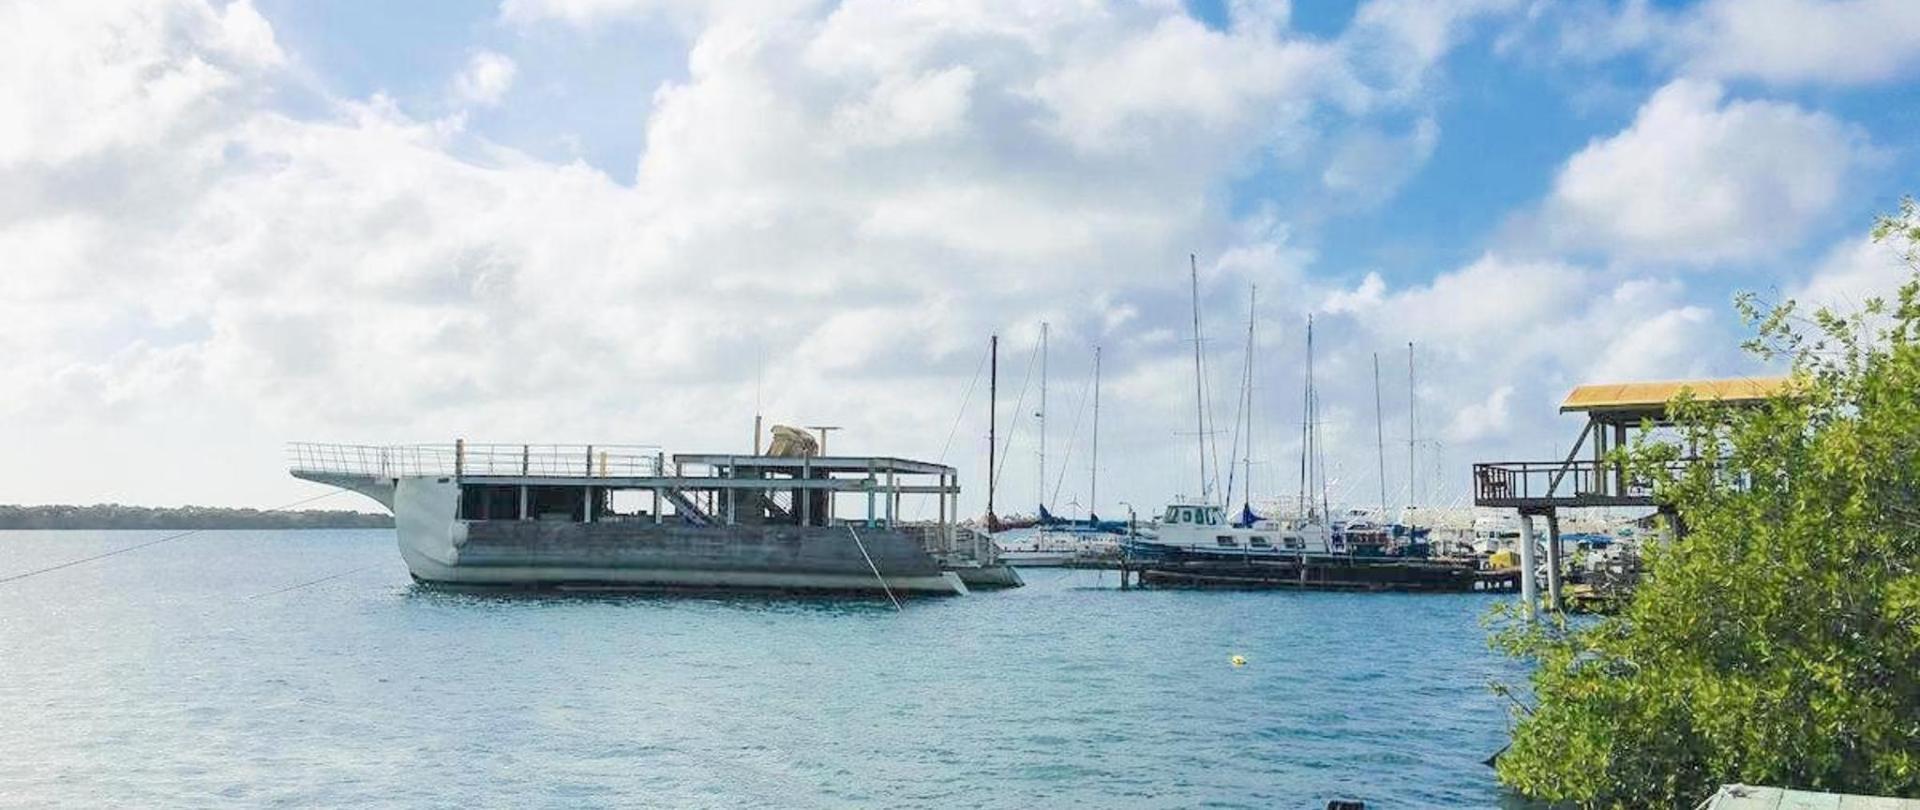 Pierdeck Yachtview Vistalmar Aruba Accommodation.jpg